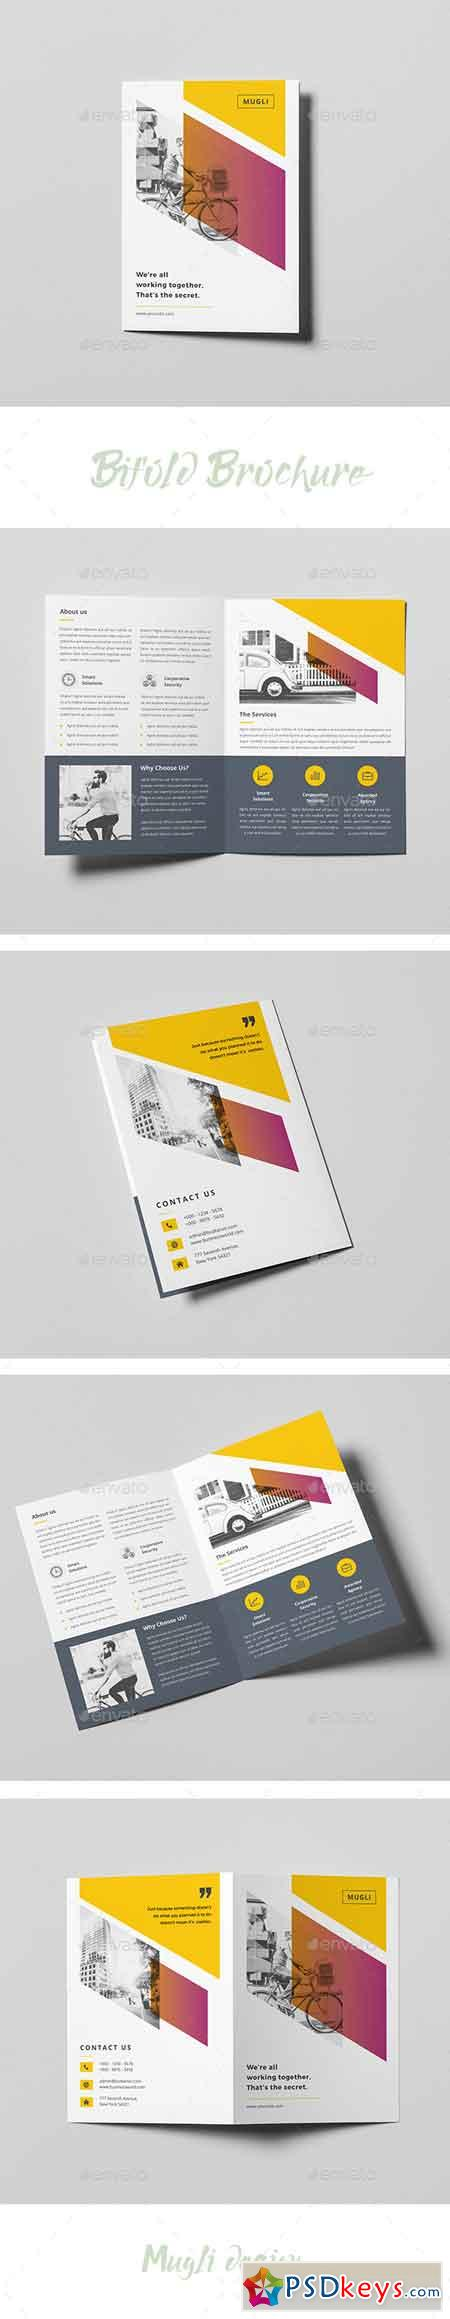 Bifold Brochure 20184697